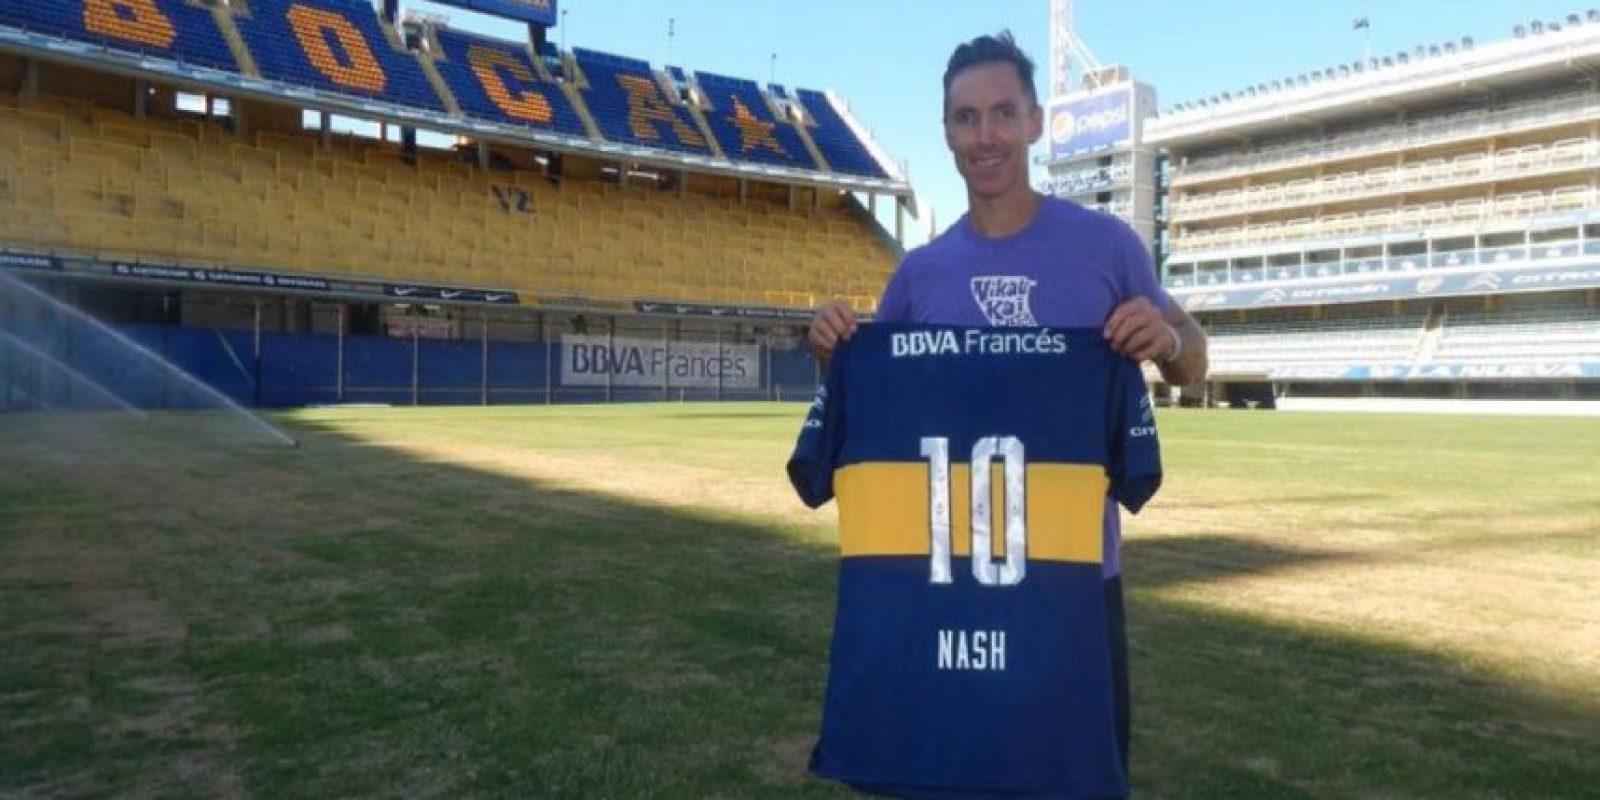 Steve Nash recibió una camiseta de Boca Juniors con su nombre y el dorsal número 10. Foto:twitter.com/BocaJrsOficial